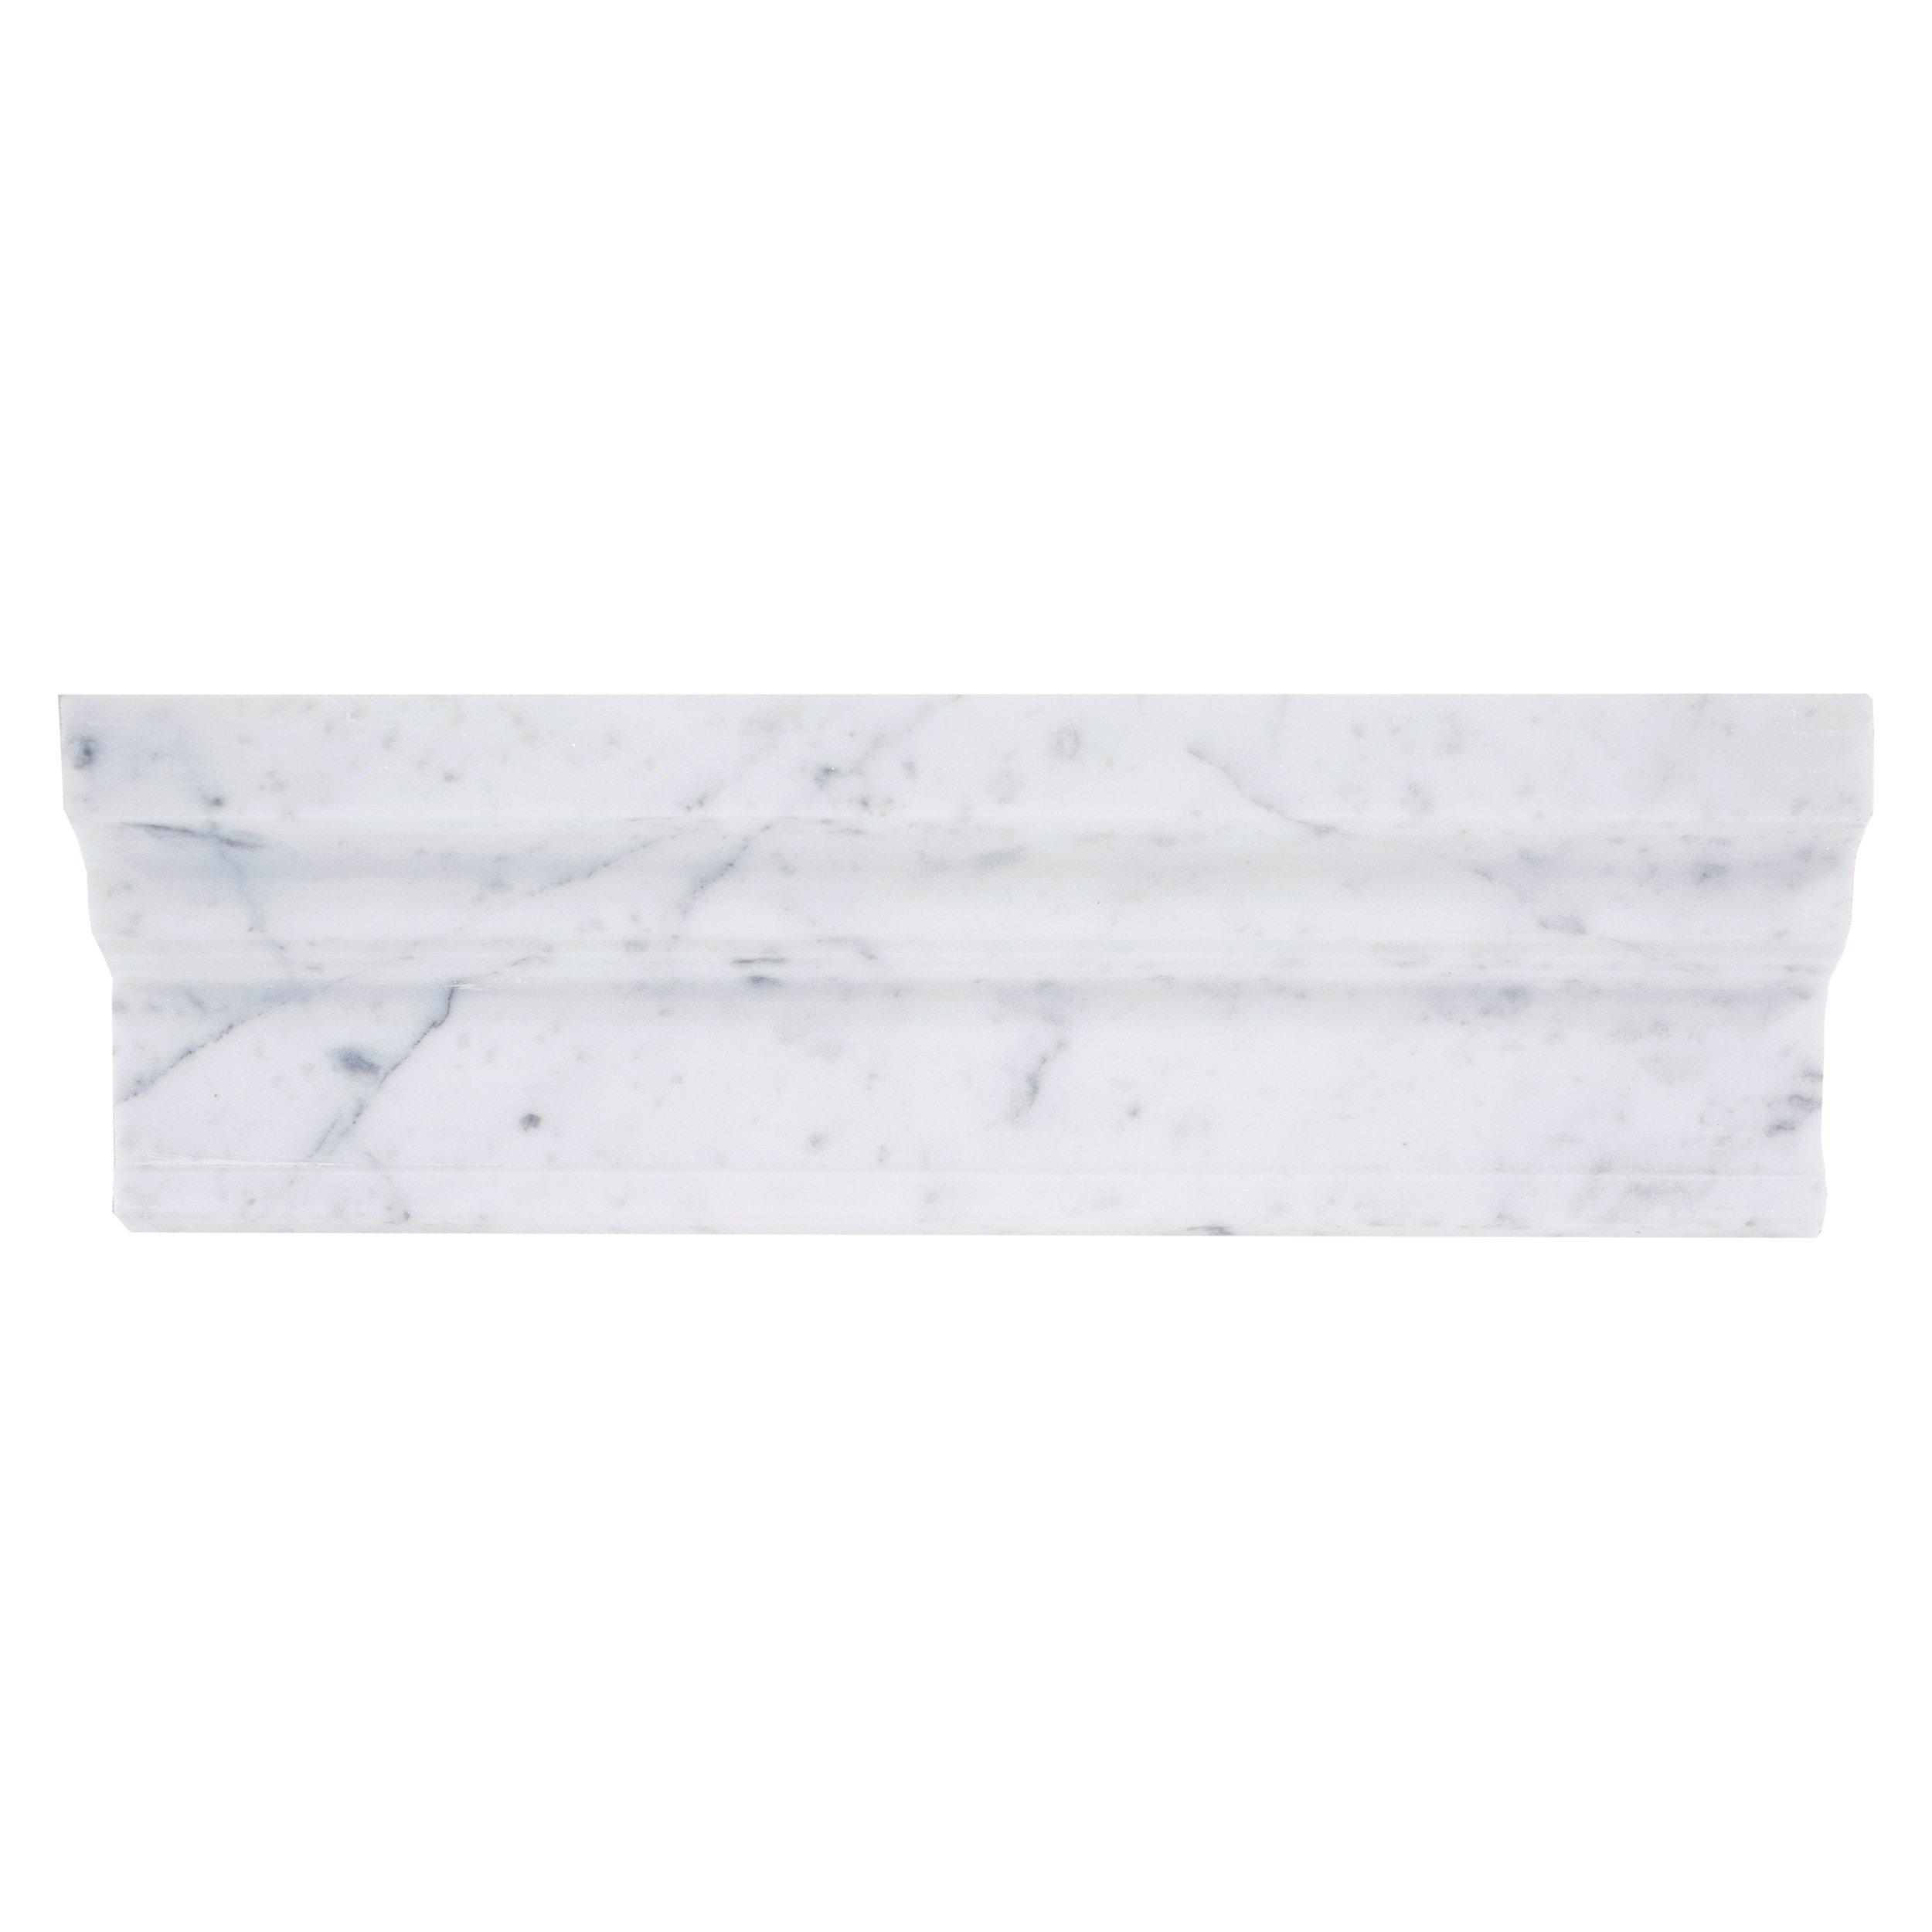 Carrara Collection Bianco Carrara Hexagon Polished Marble